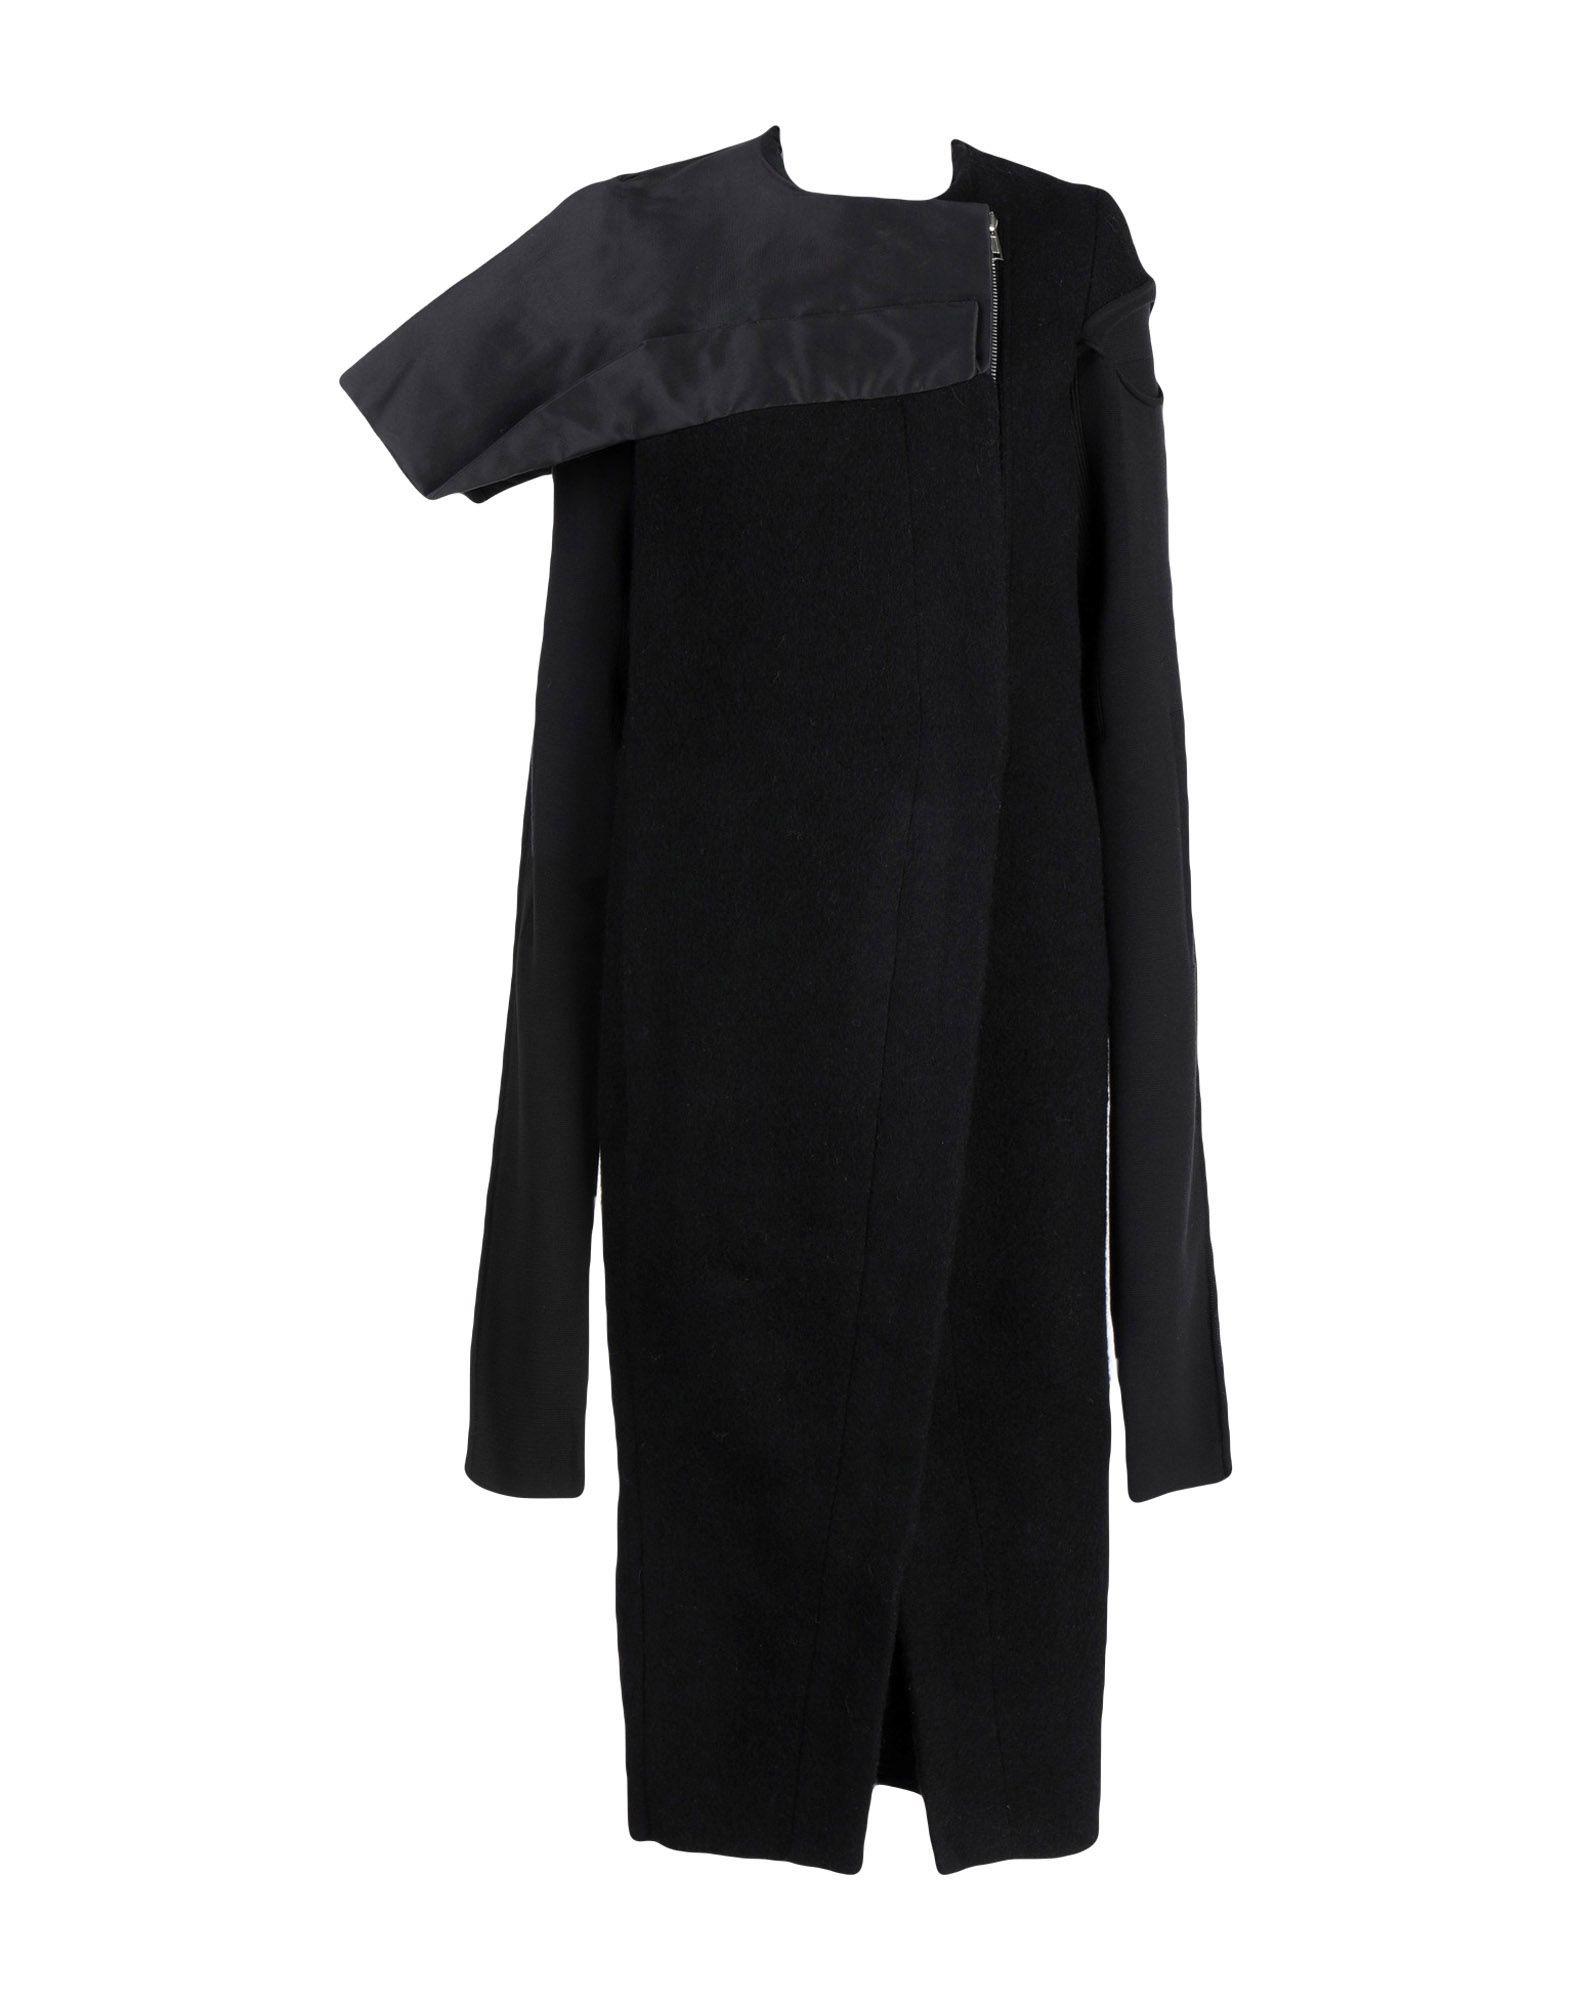 Rick Owens Coat In Black